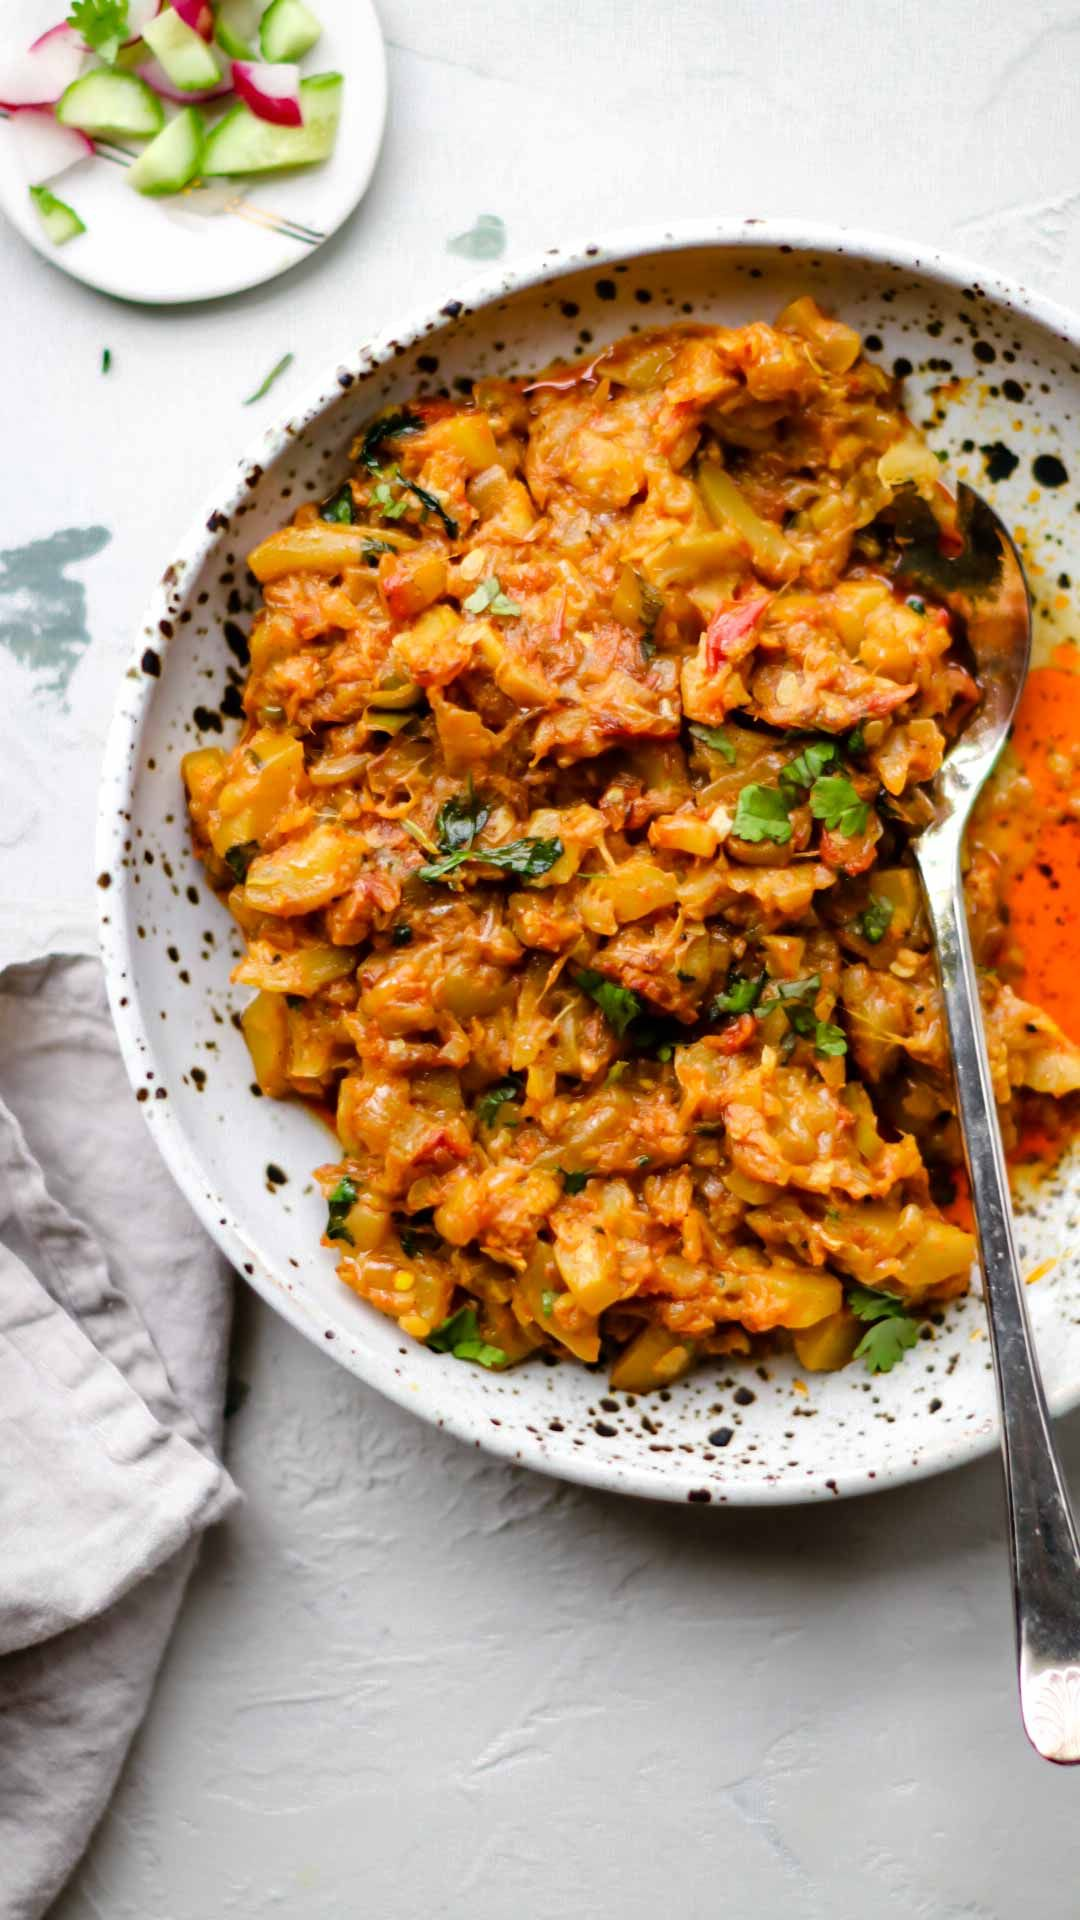 Pakistani Zucchini Courgette Curry Toriyan Torai Ki Sabzi Recipe Zucchini Curry Zucchini Recipes Curry